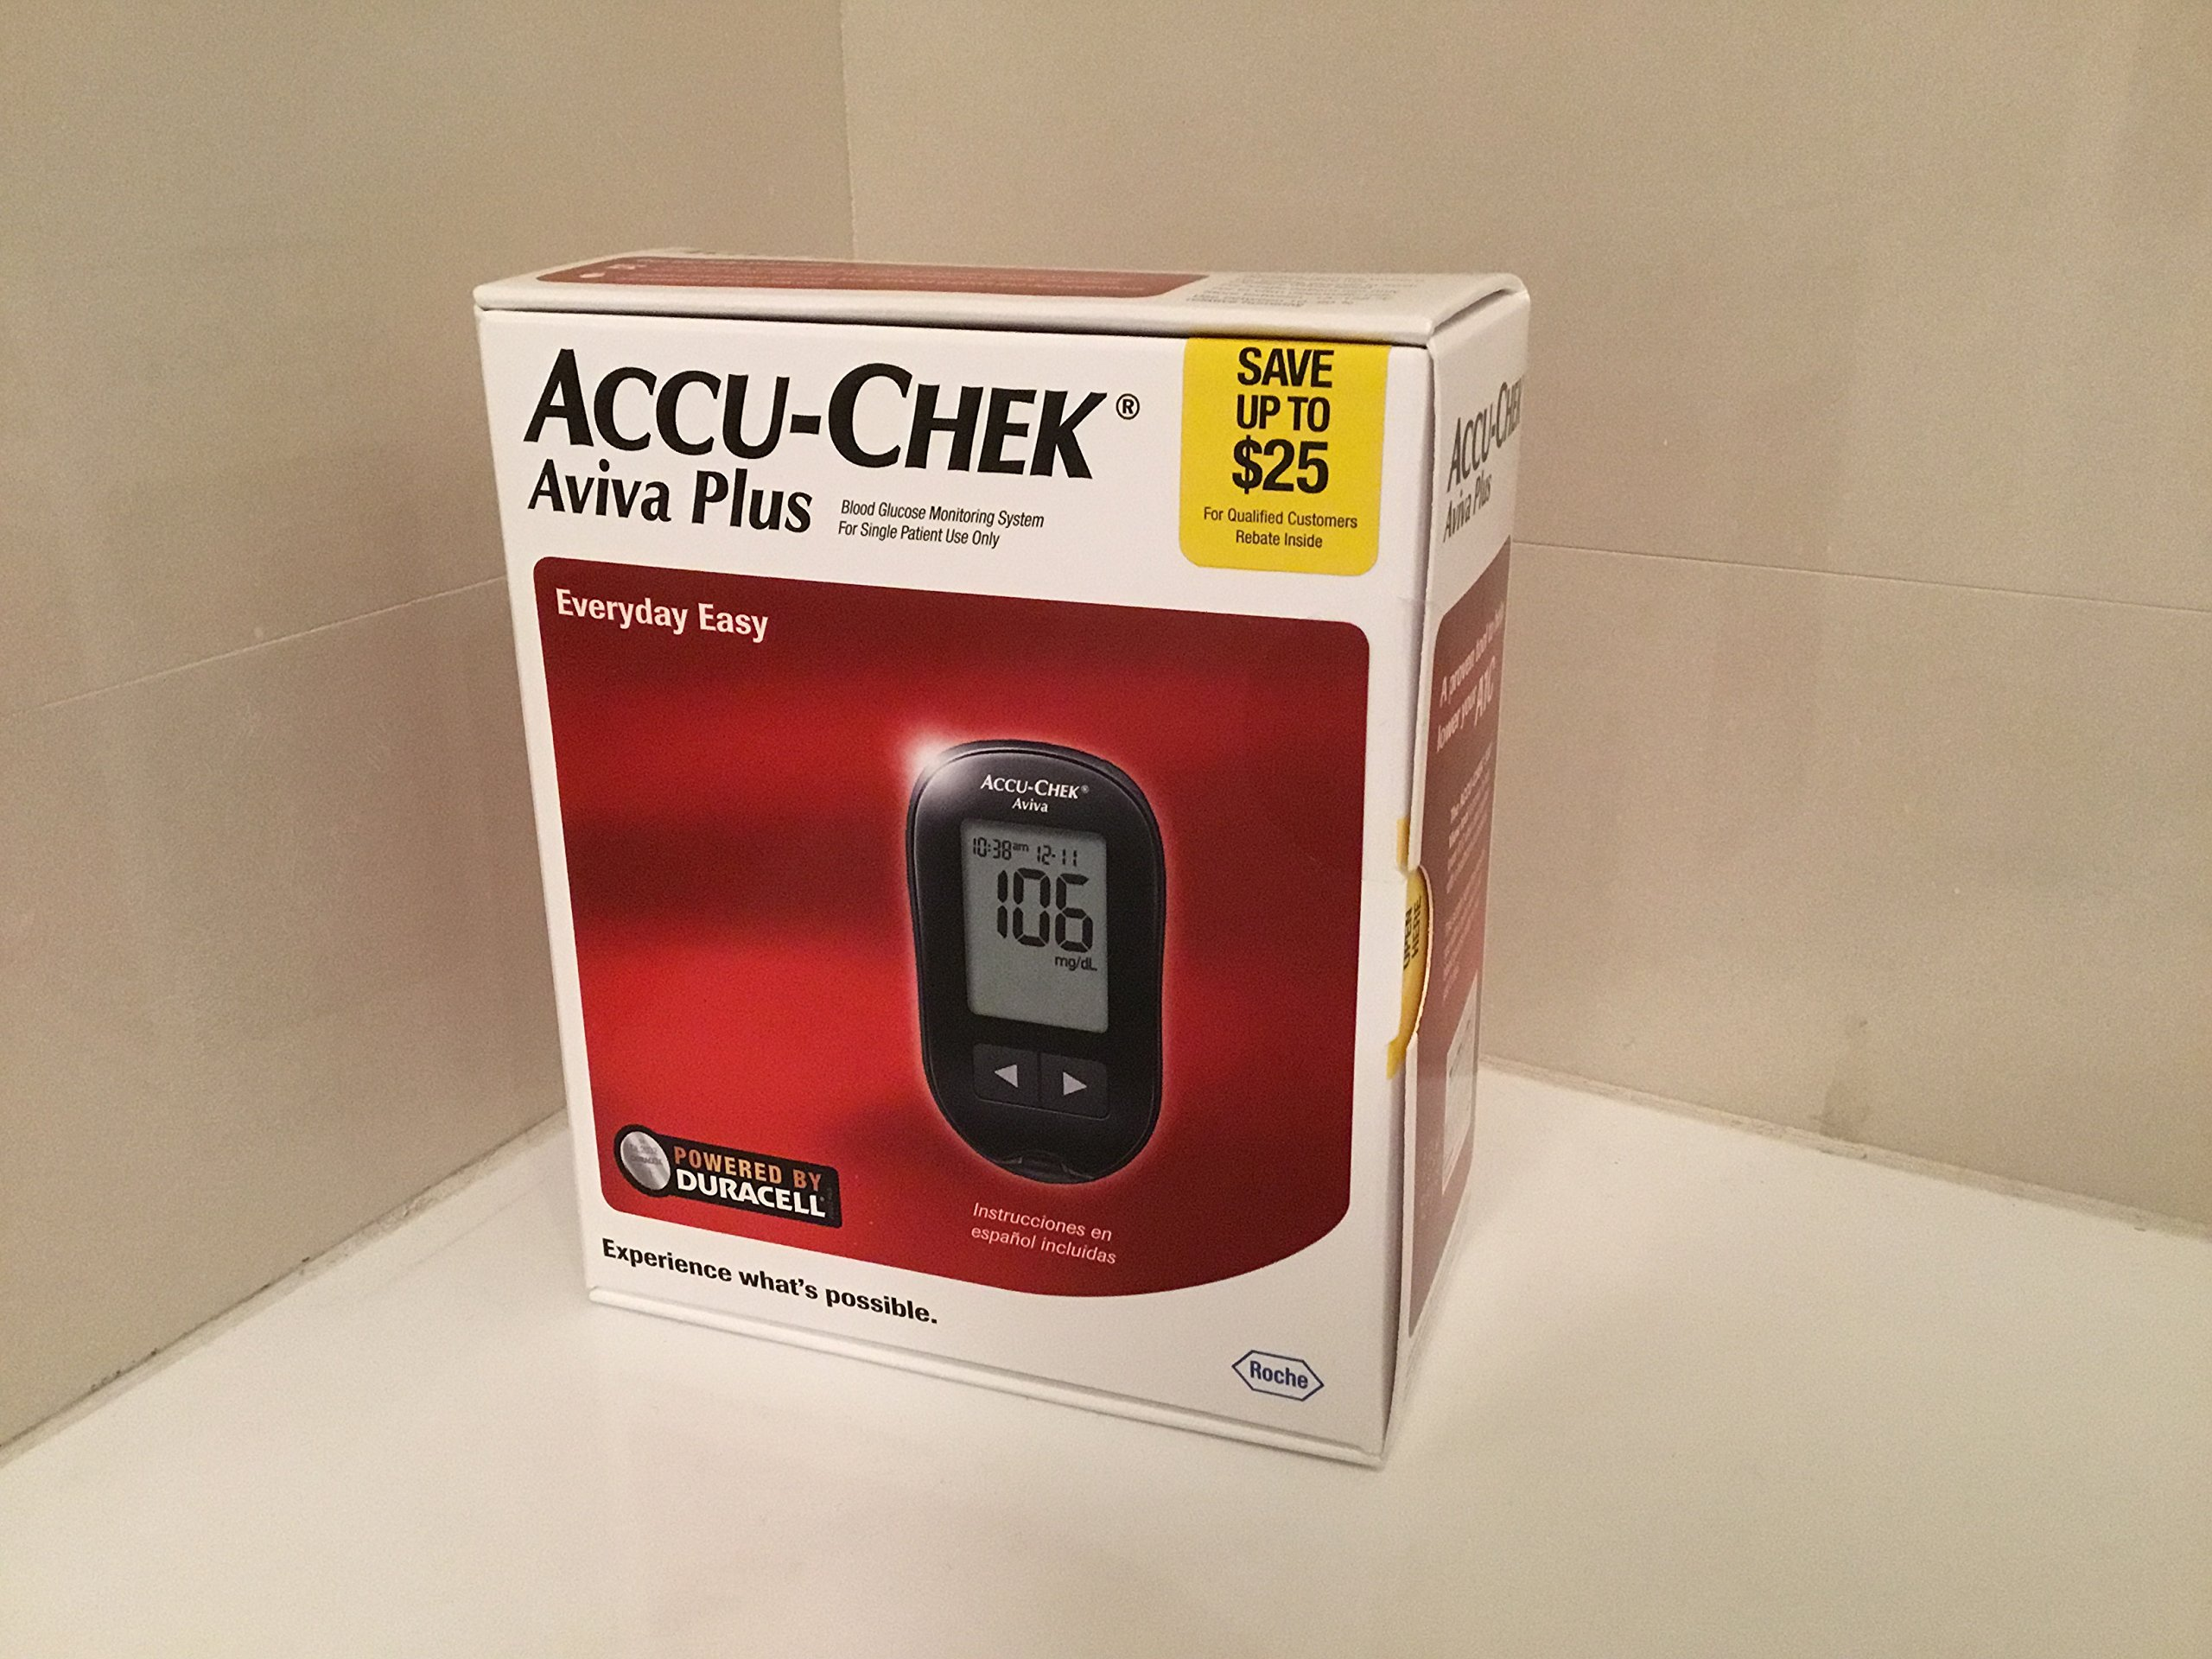 Roche 365702101104 Accu-Chek Aviva Diabetes Monitoring Kit - Meter System